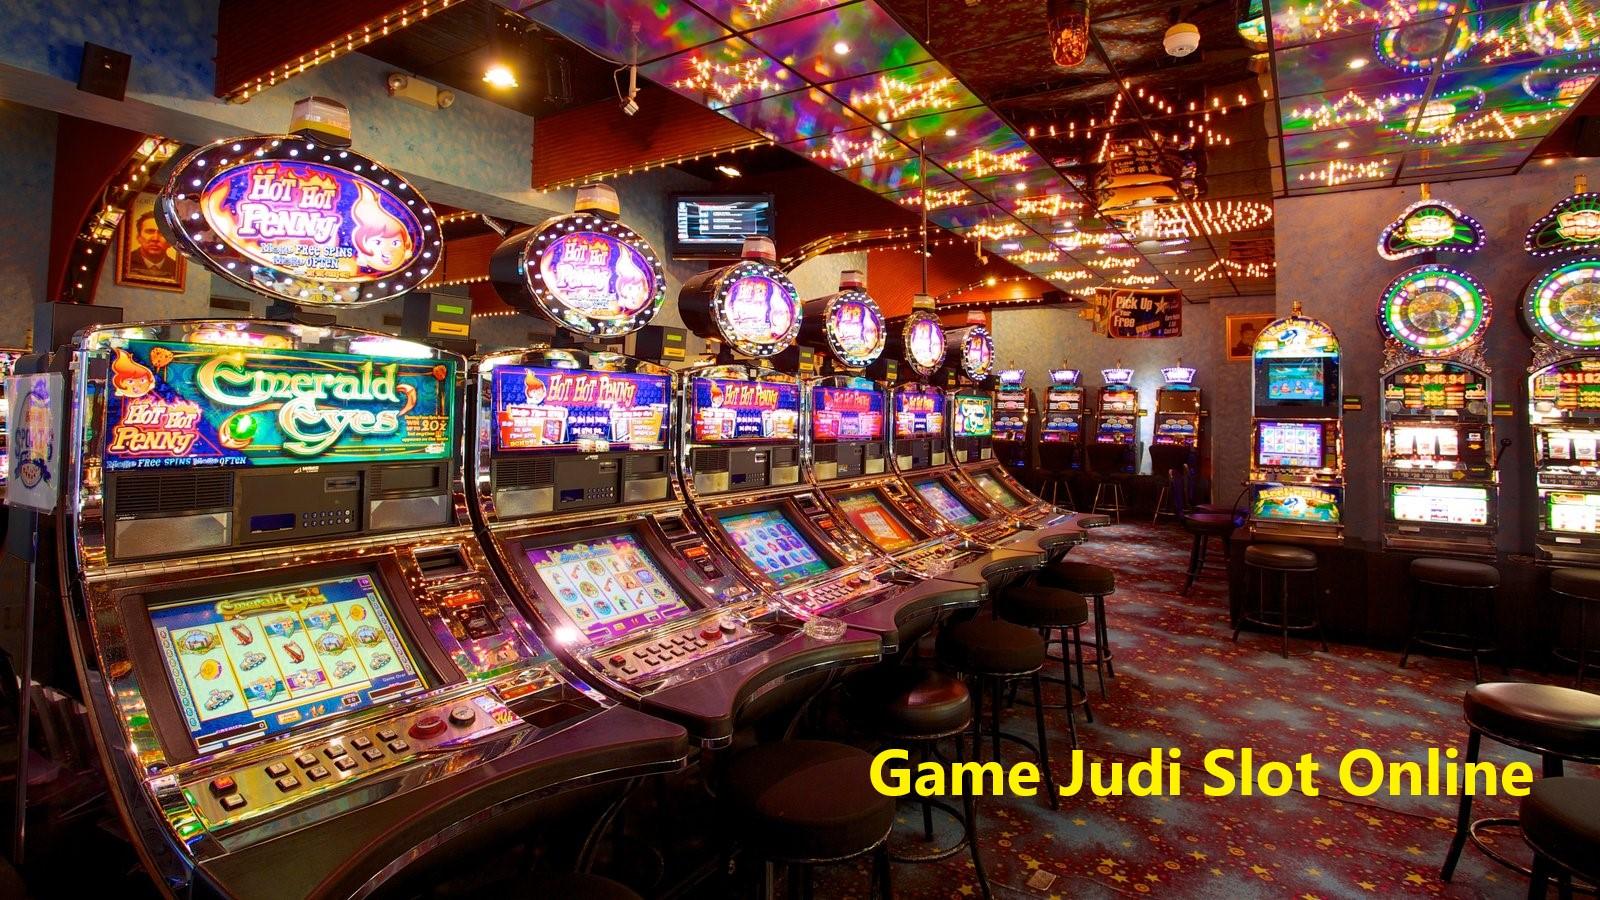 Website Game Judi Slot Online Terpercaya